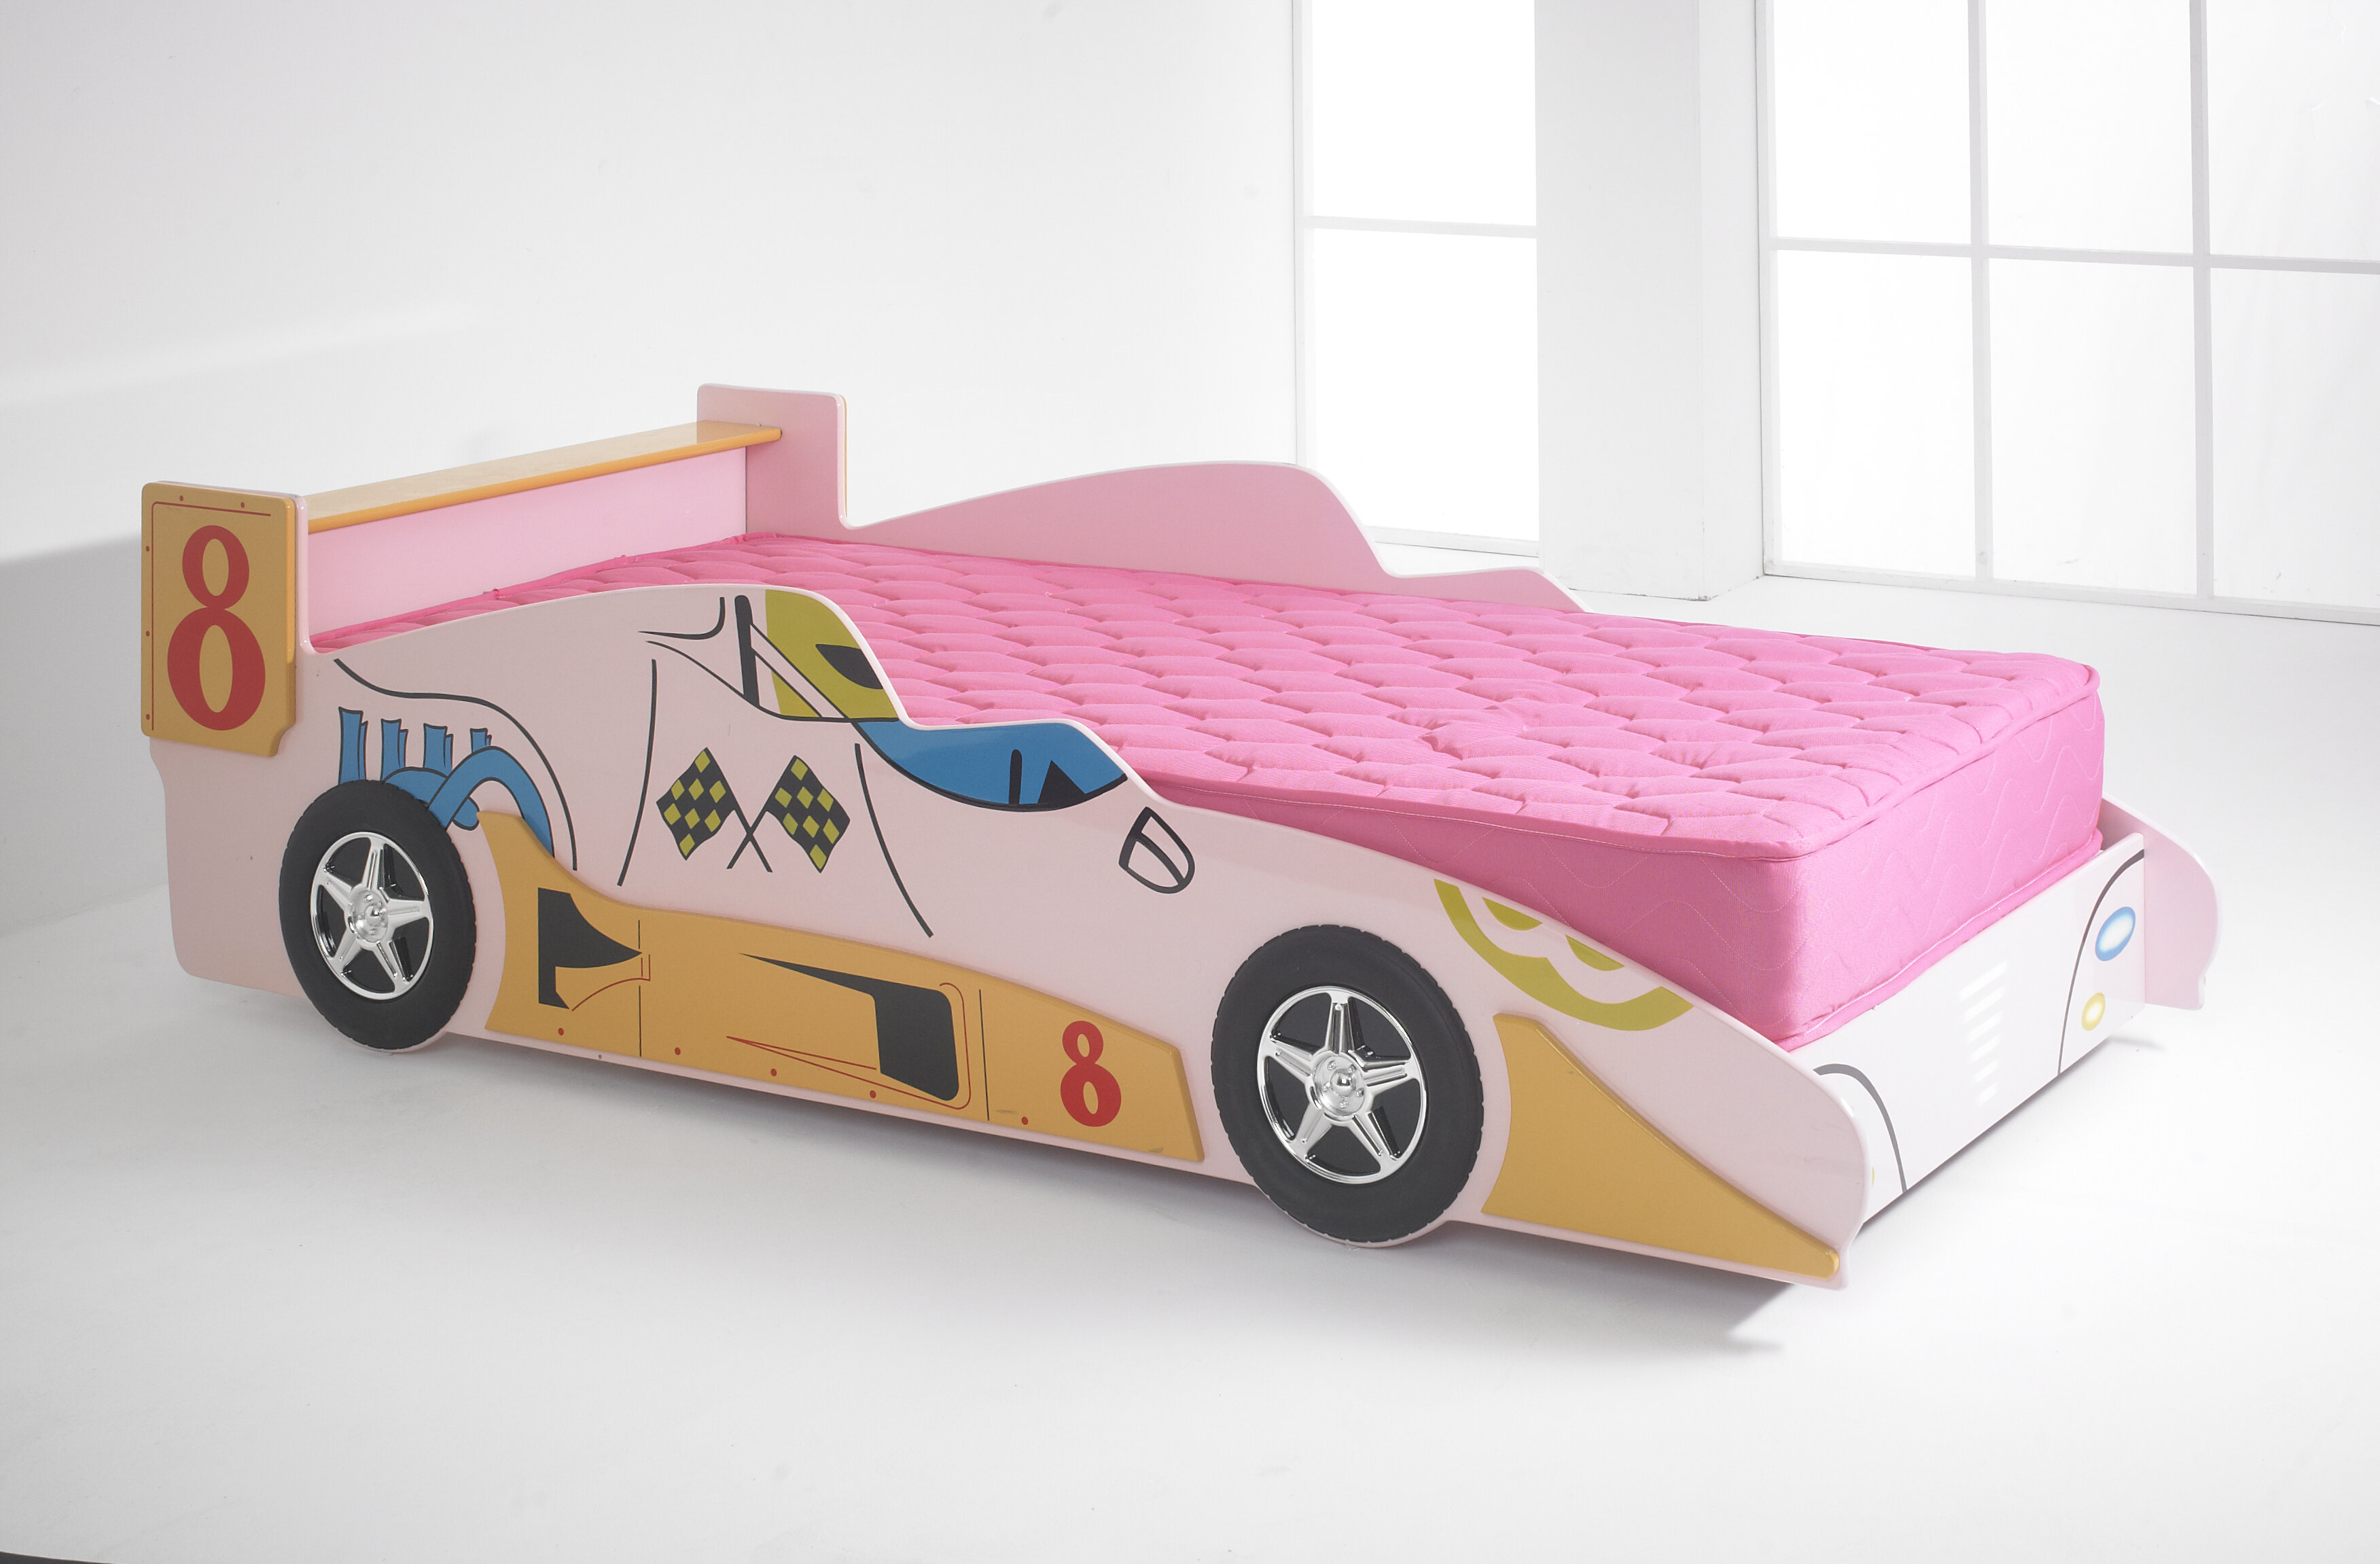 M&H Designs F1 European Single Car Bed | Wayfair.co.uk